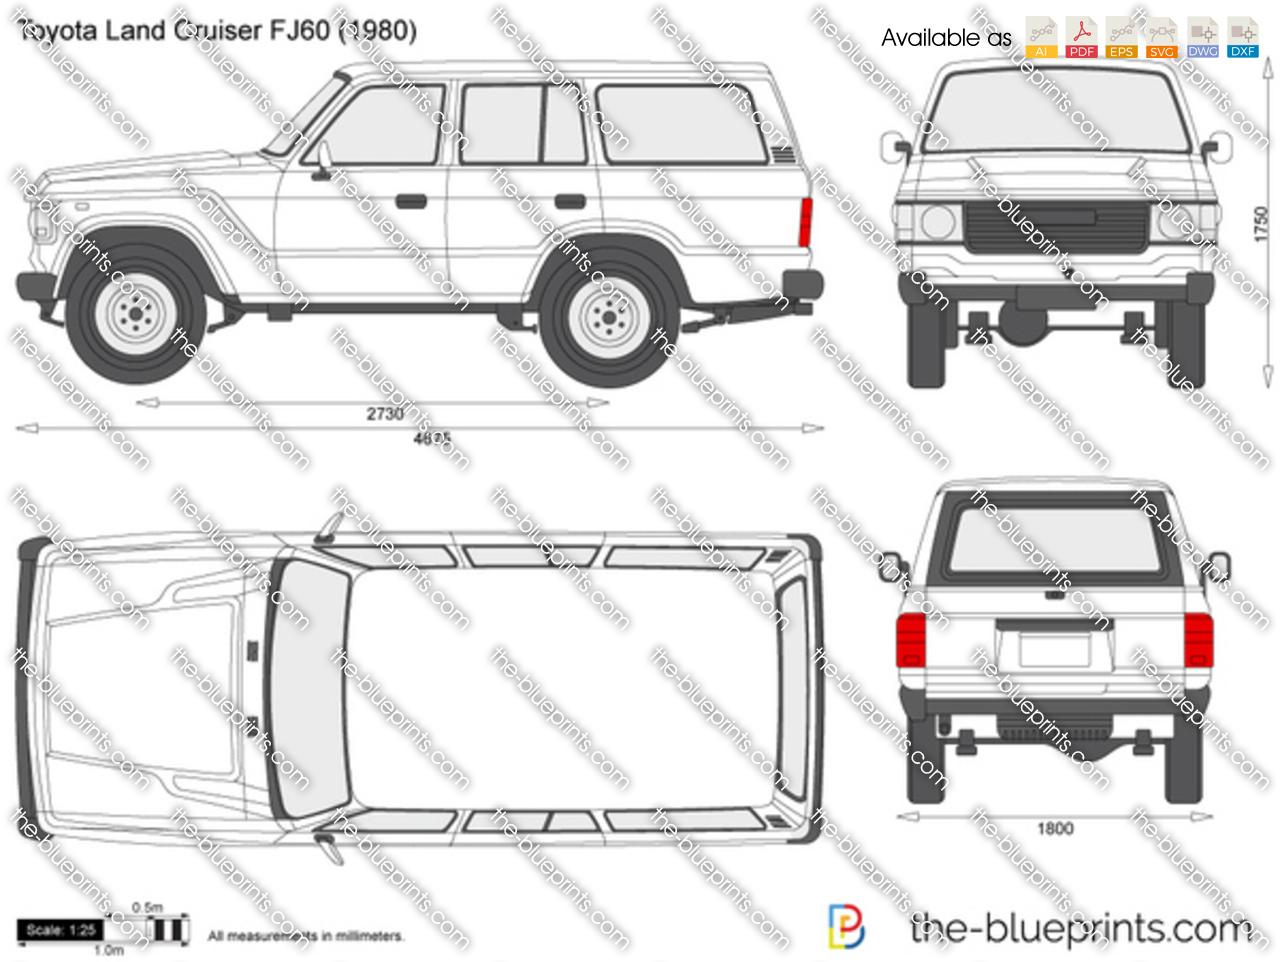 Toyota Land Cruiser Fj60 Vector Drawing